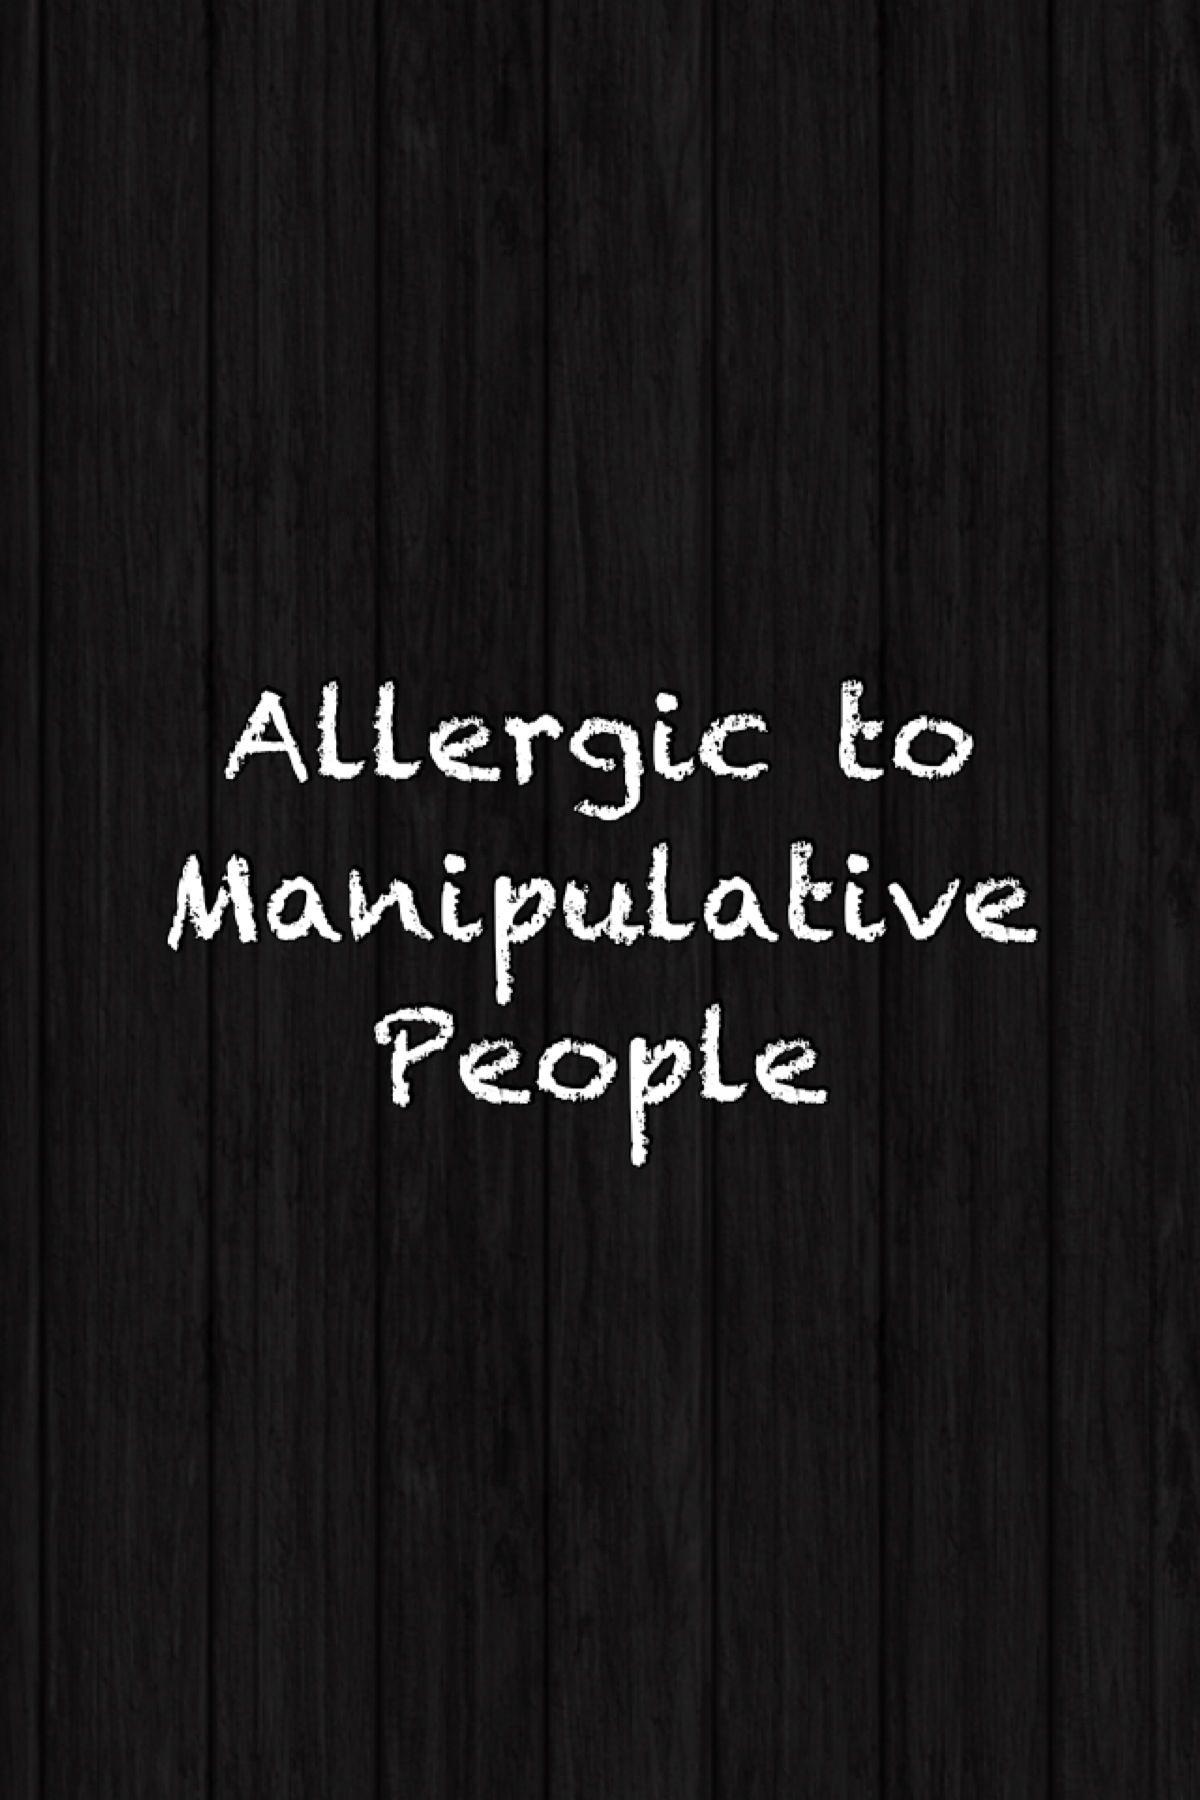 Manipulative People Make Me Sick Manipulative People Quotes Manipulative People People Quotes